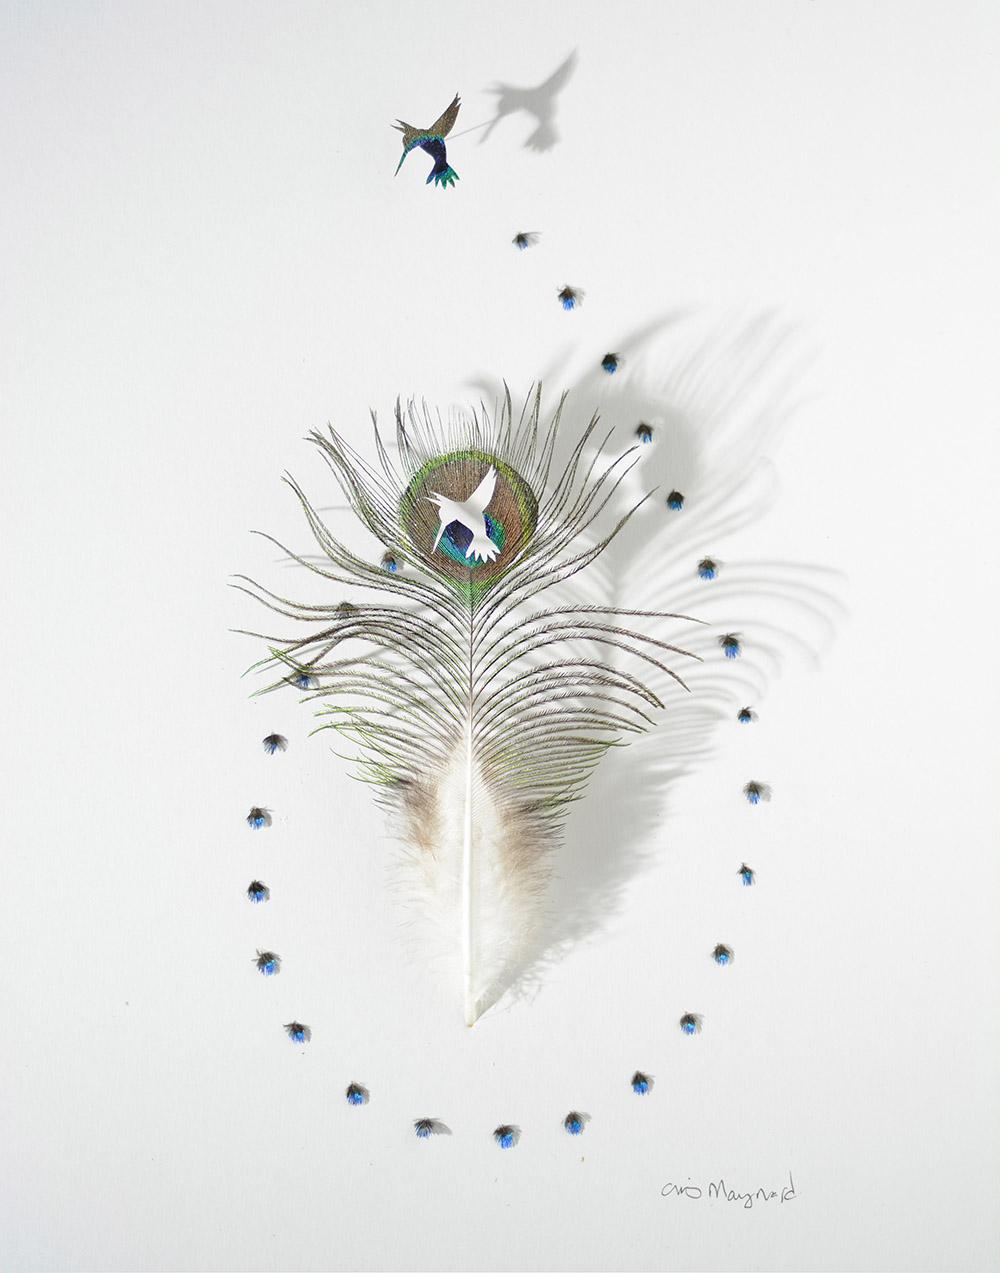 произведения из перьев, Крис Мэйнард, Chris Maynard